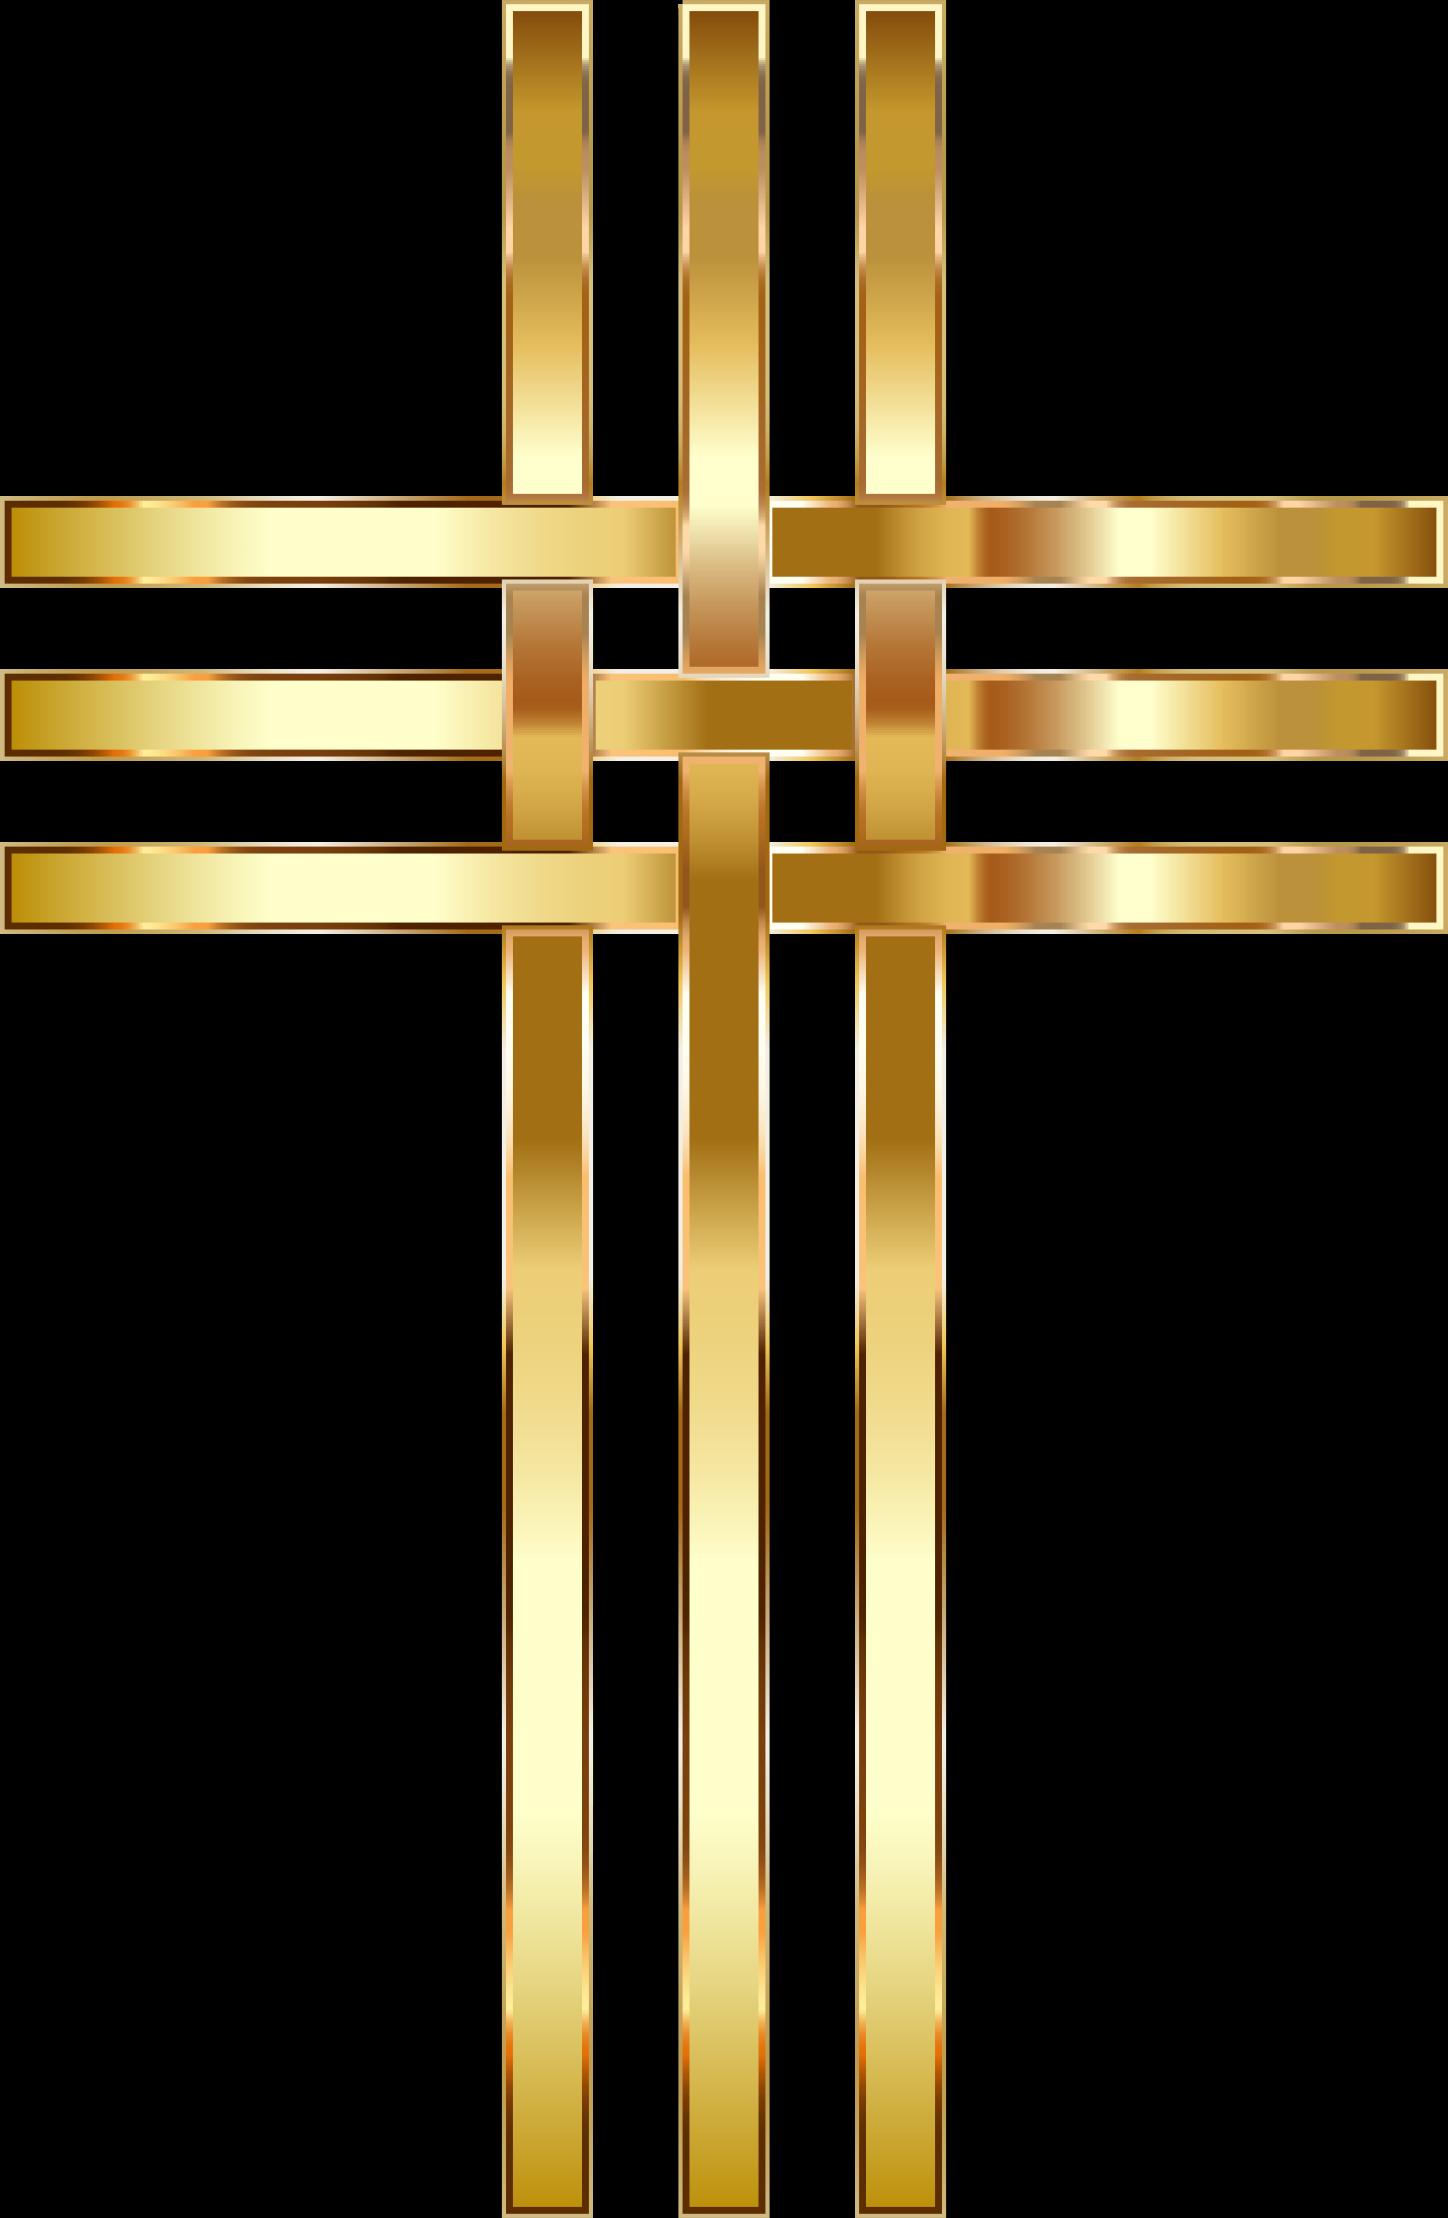 Clipart Interlocked Stylized Golden Cross No Background